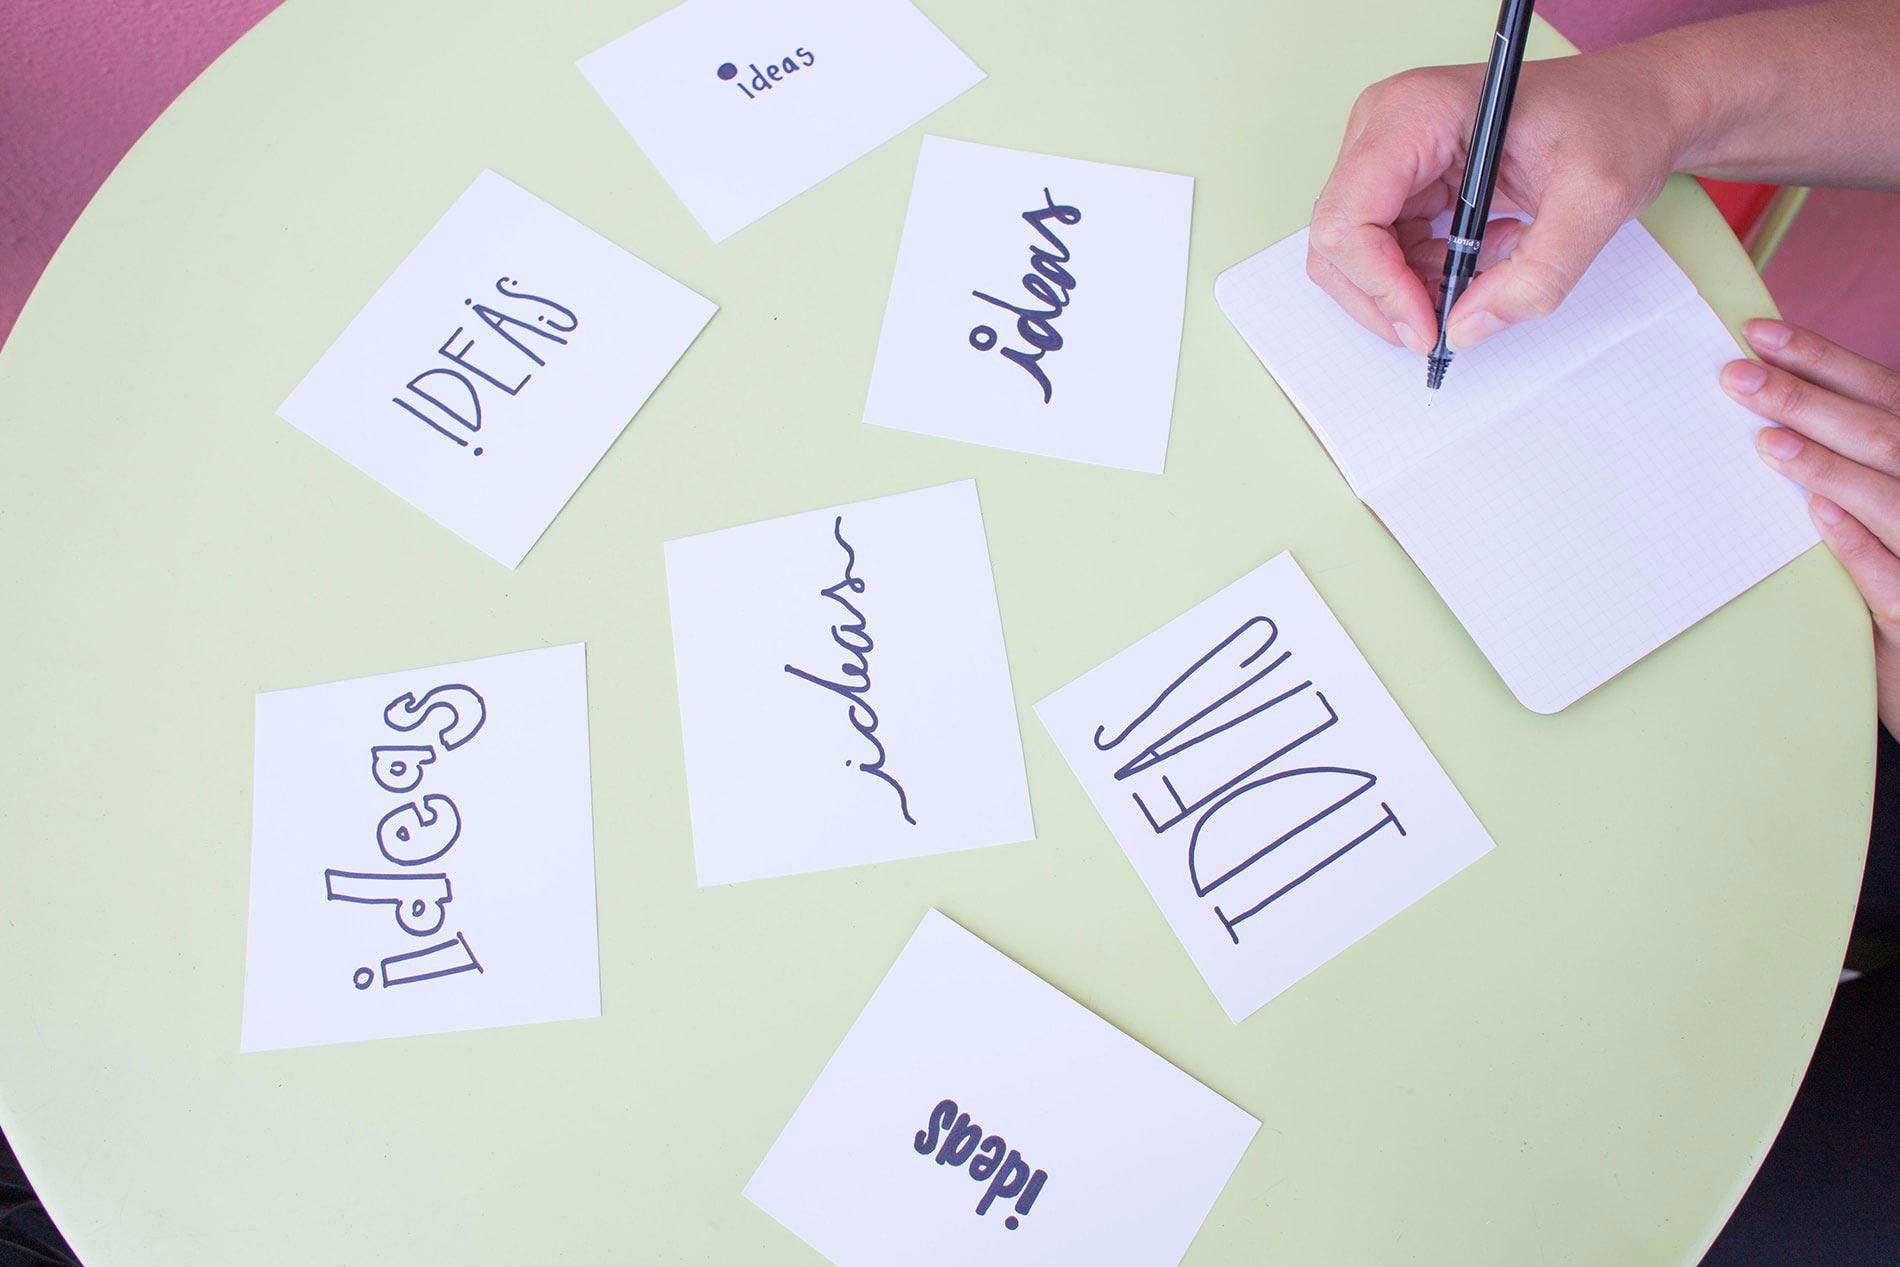 innovation-ideas-on-paper